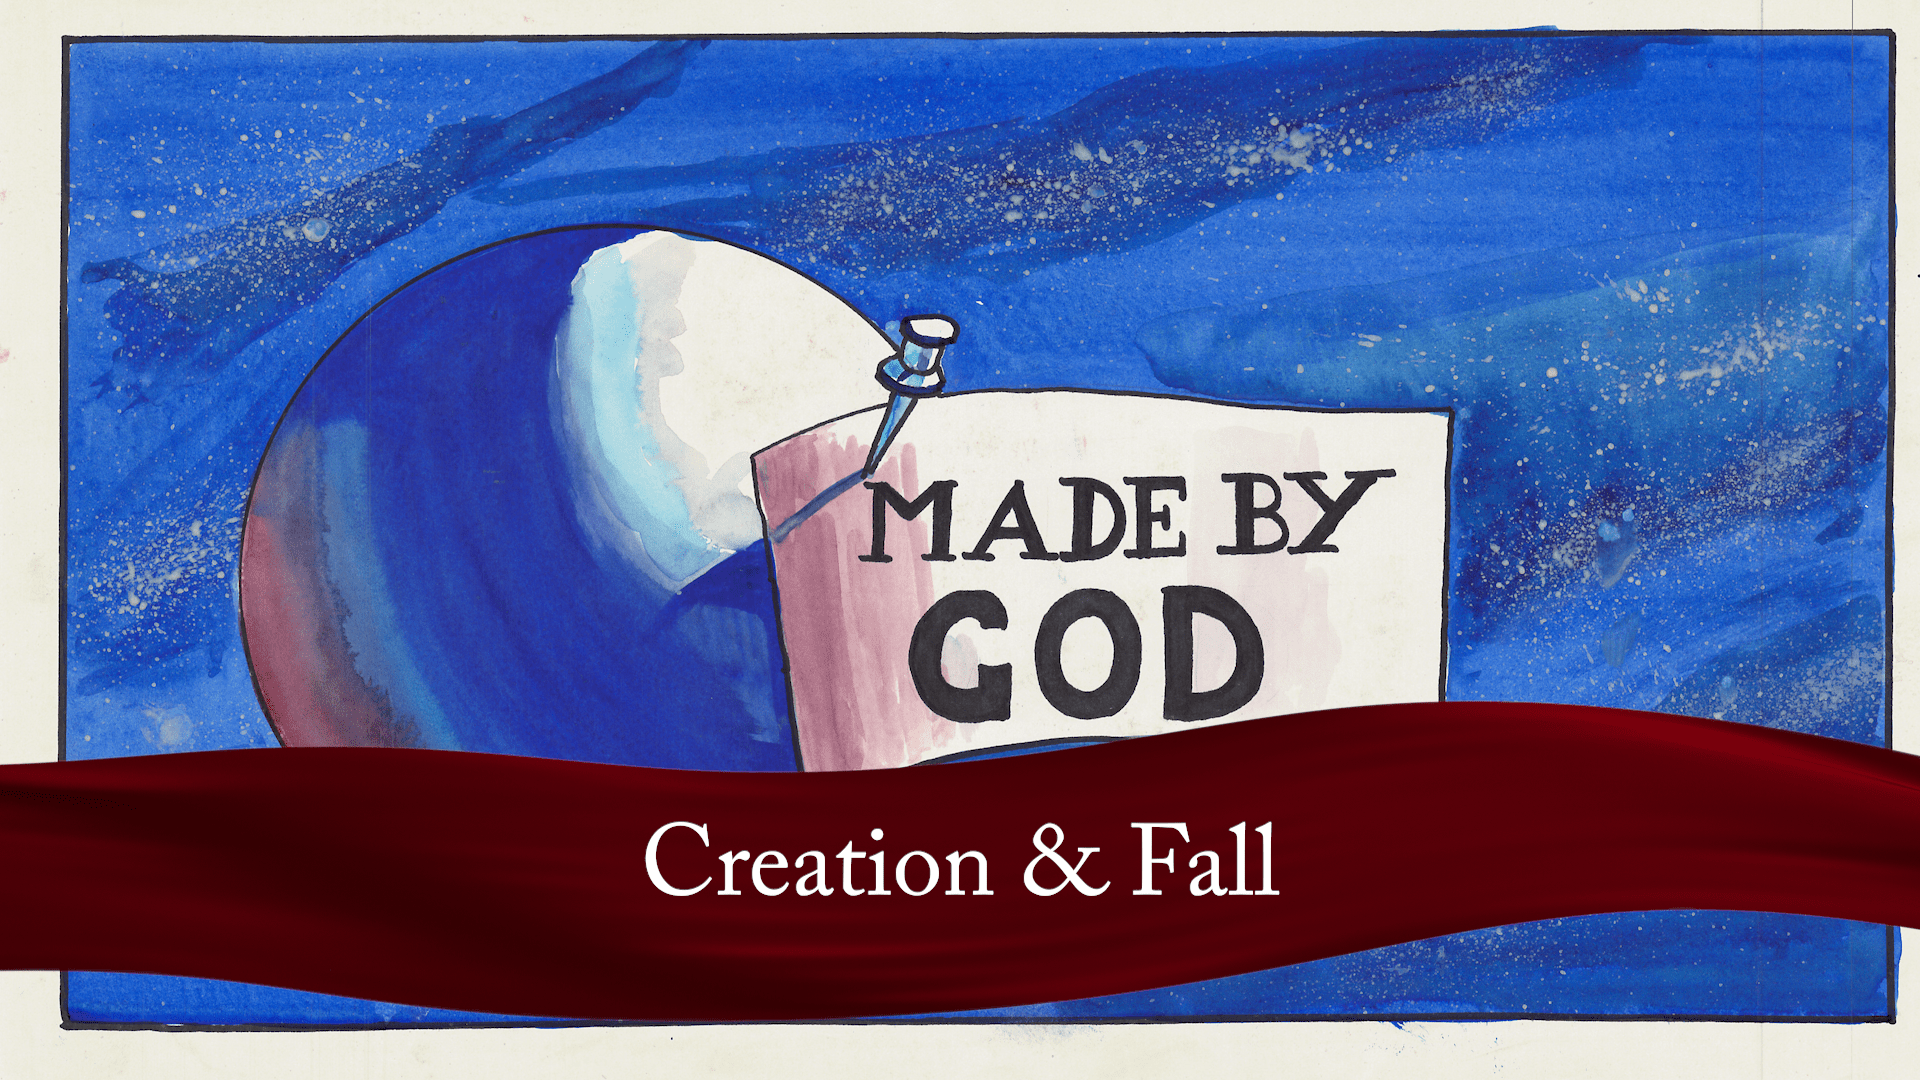 Creation & Fall